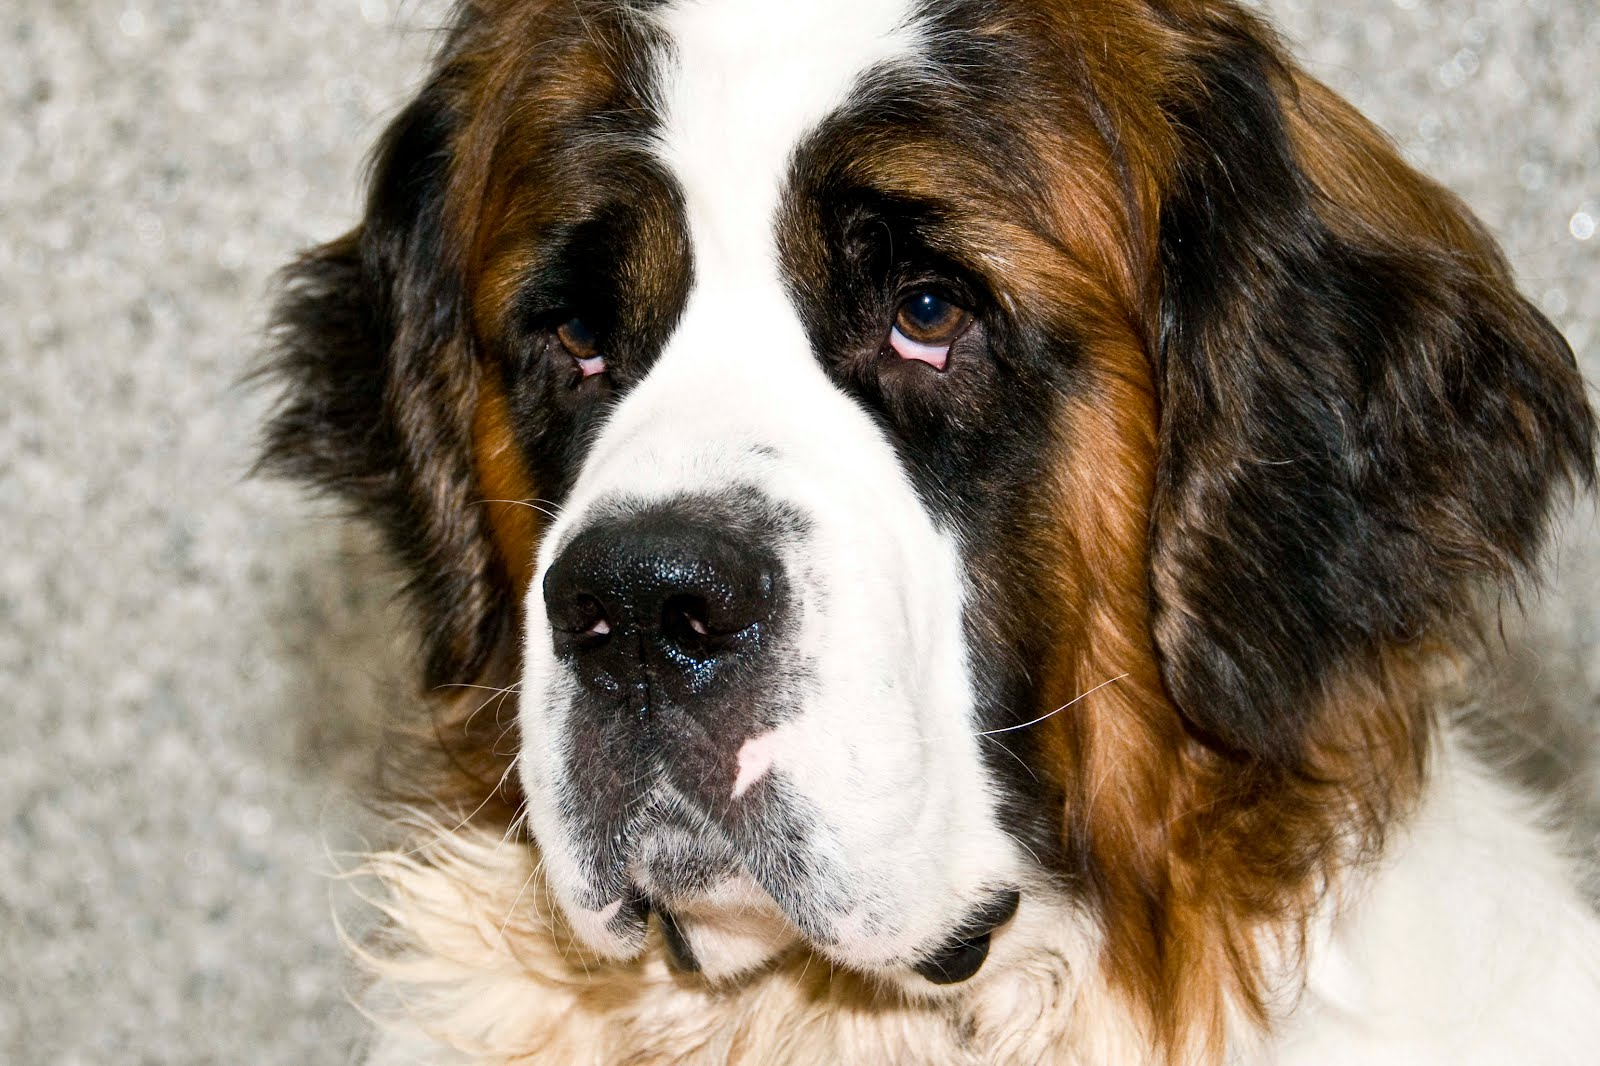 St.Bernanrd dog face wallpaper